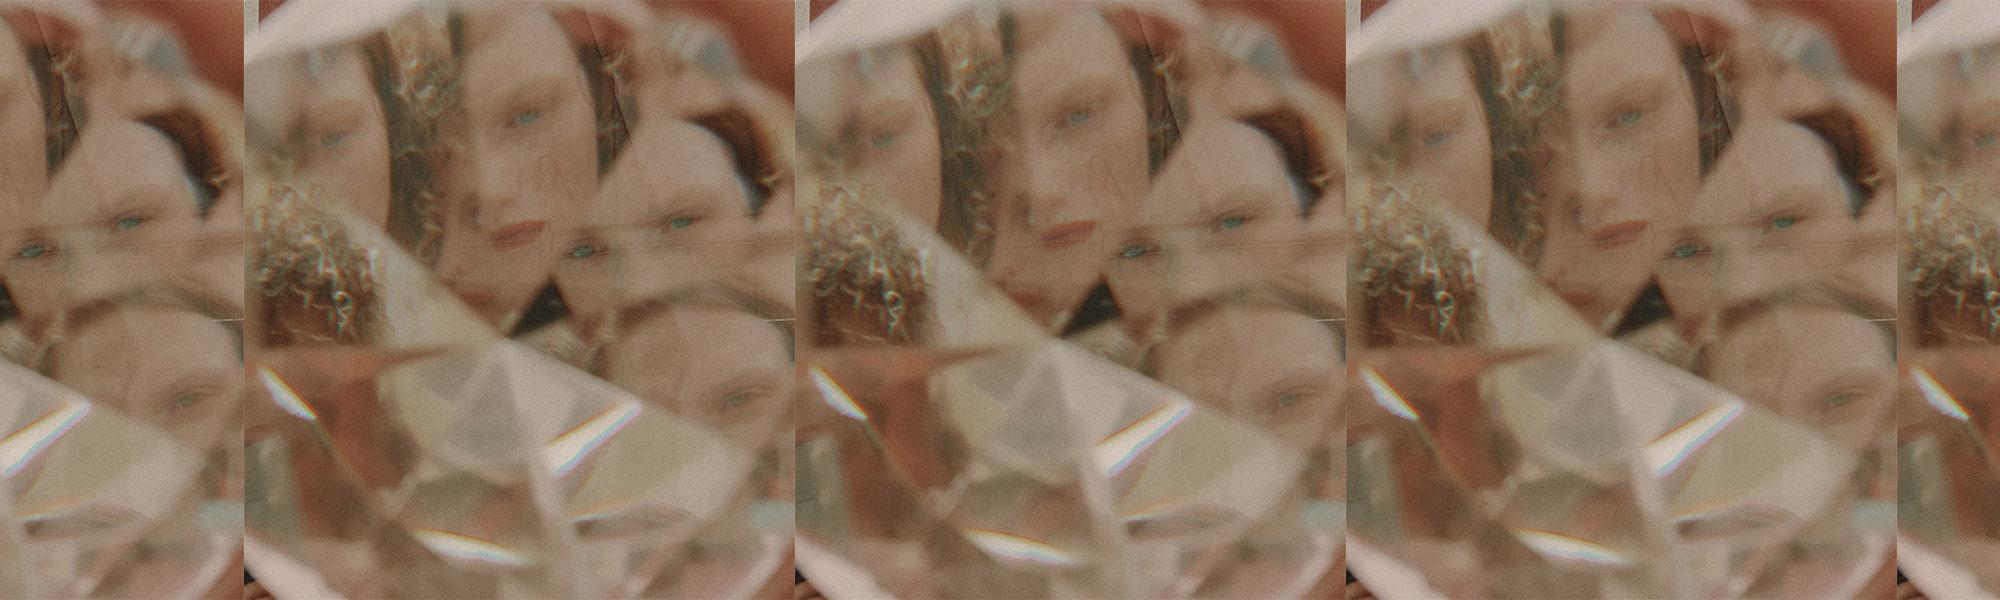 Photography   Izack Morales   Style   Chino Castilla     Art Director   Dali Project     Makeup     Ana G de V     Hair     Juan Carlos Arriola     Talents     Emi Red   ,    Megan Otnes     and   Gemma Janes     at     WANTED & BANG Management     Production     Ximena Morfín     Fashion Editor   Raúl Alvarez     Editor in Chief   Claudia Cándano